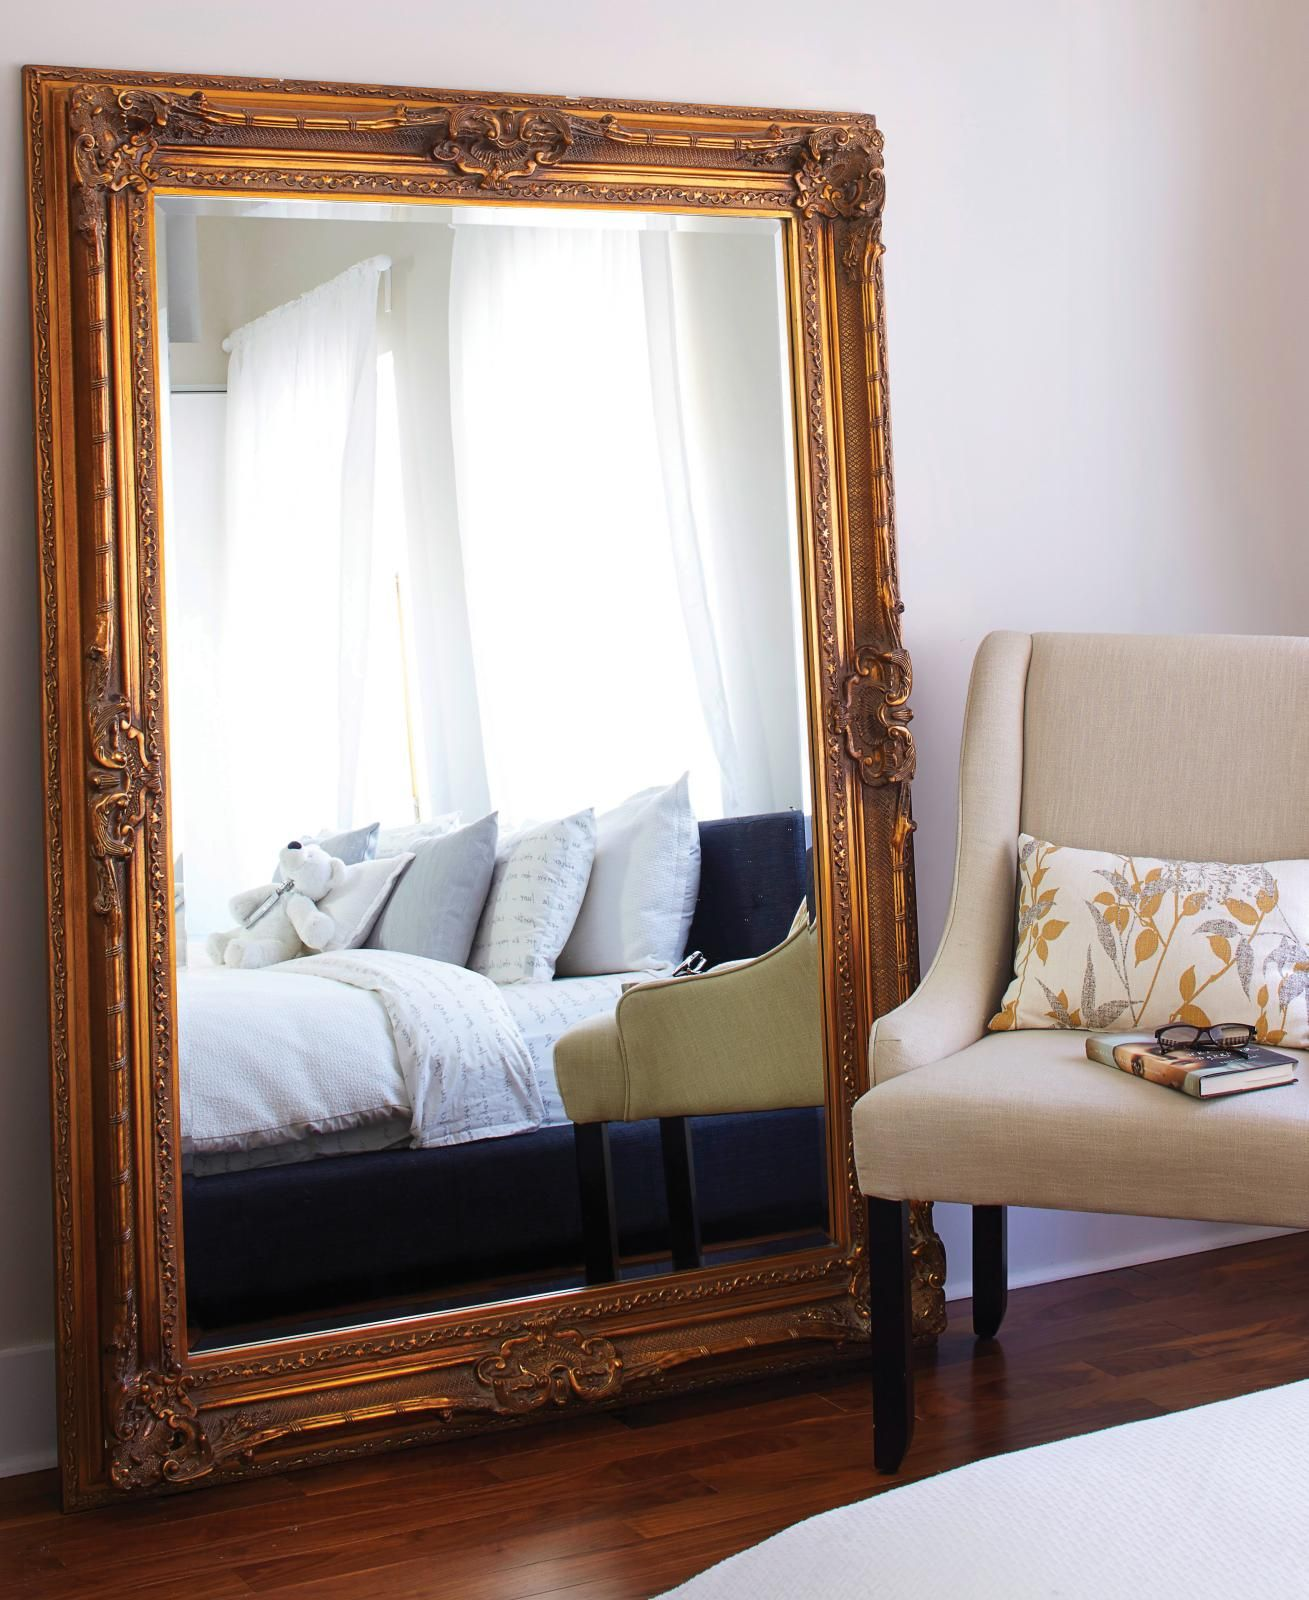 Maison unifamiliale la fibre urbaine m i r o i r m i r o i r pinterest maison for Grand miroir sol